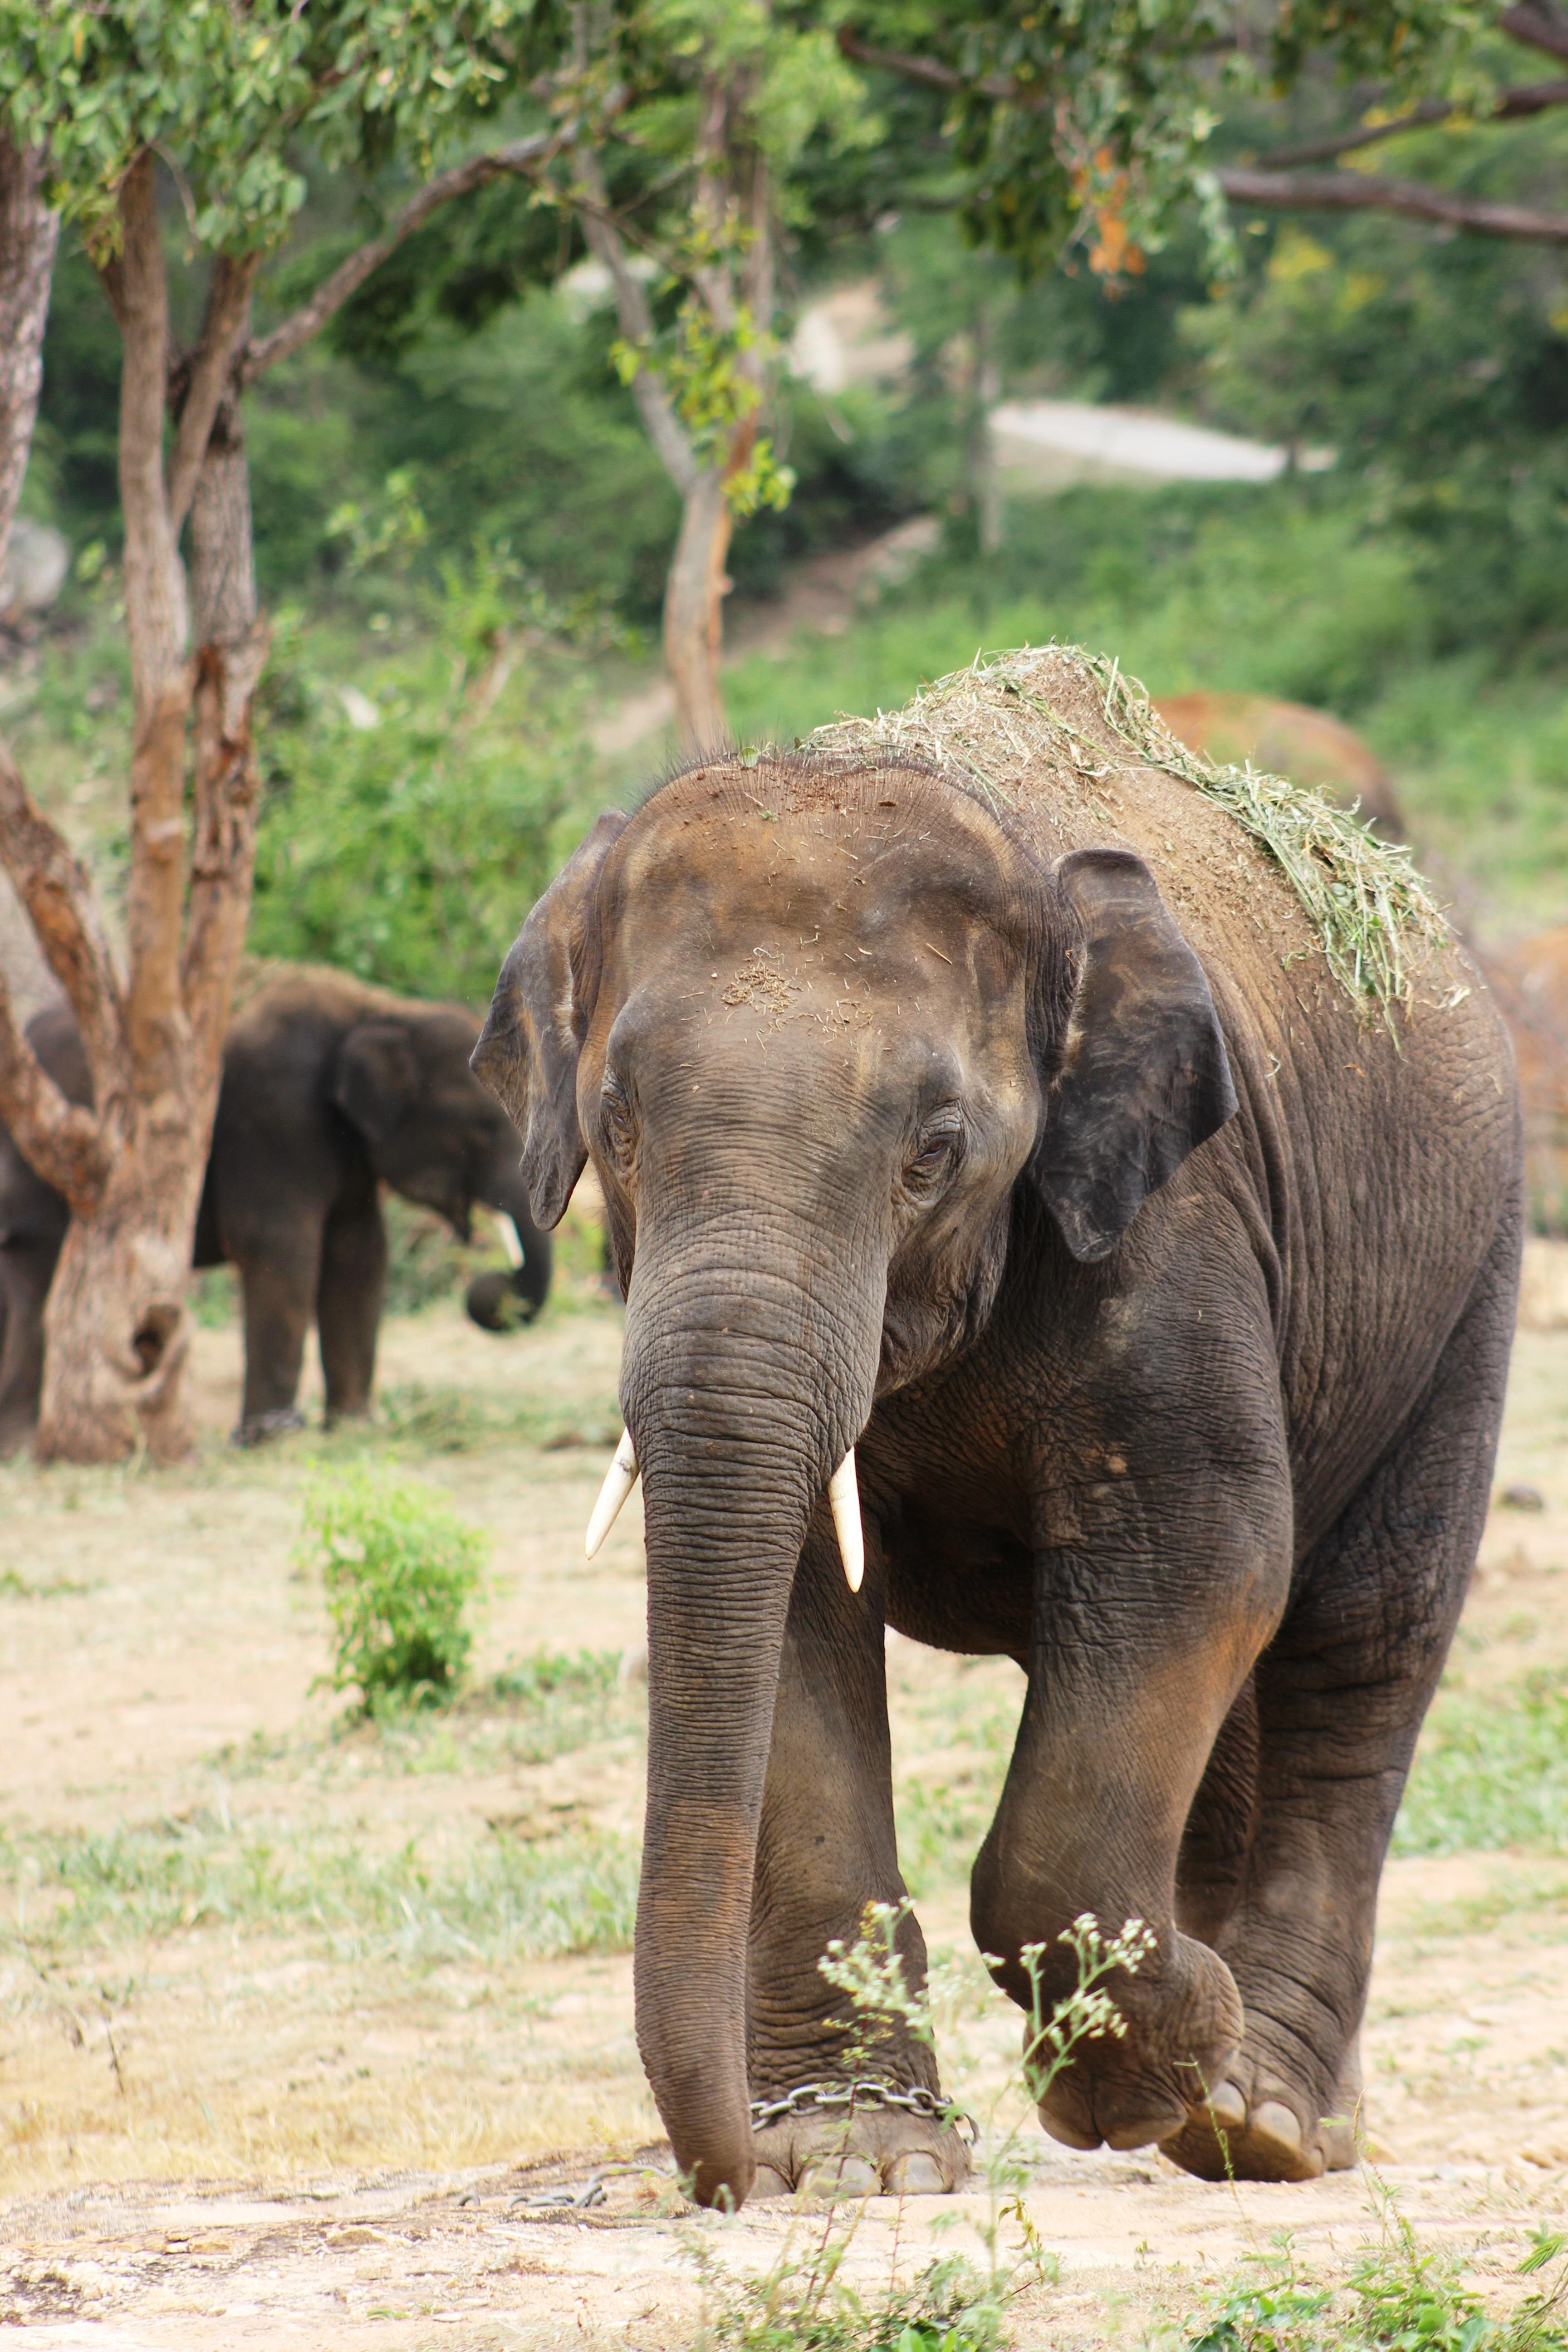 Brown Elephant On Ground 183 Free Stock Photo